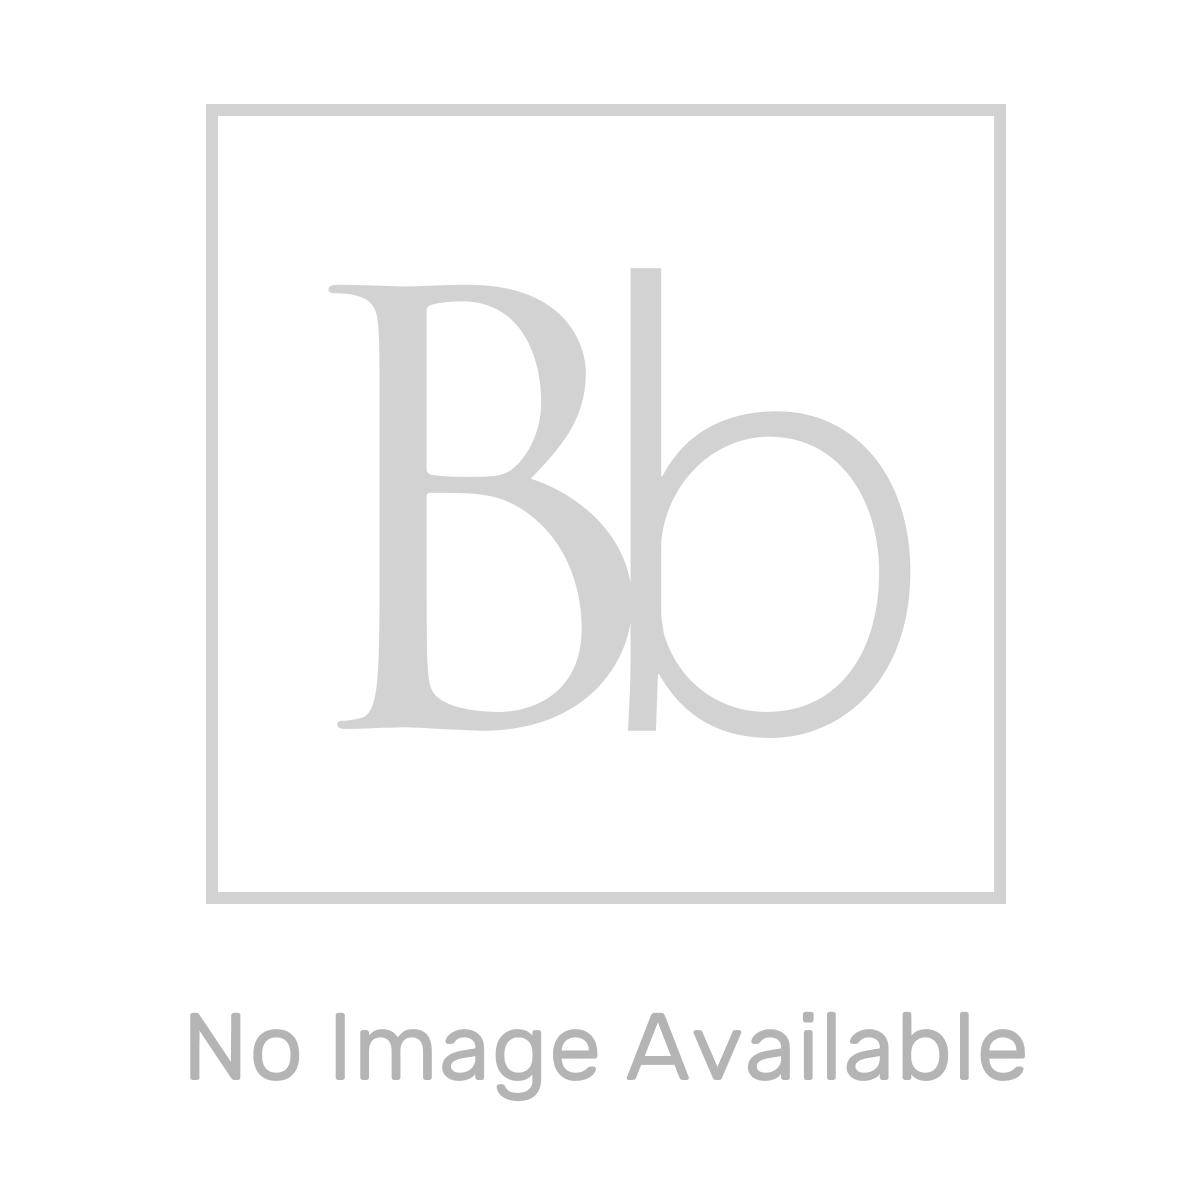 Aquadart Grey Slate Shower Tray 1400 x 700 Overhead